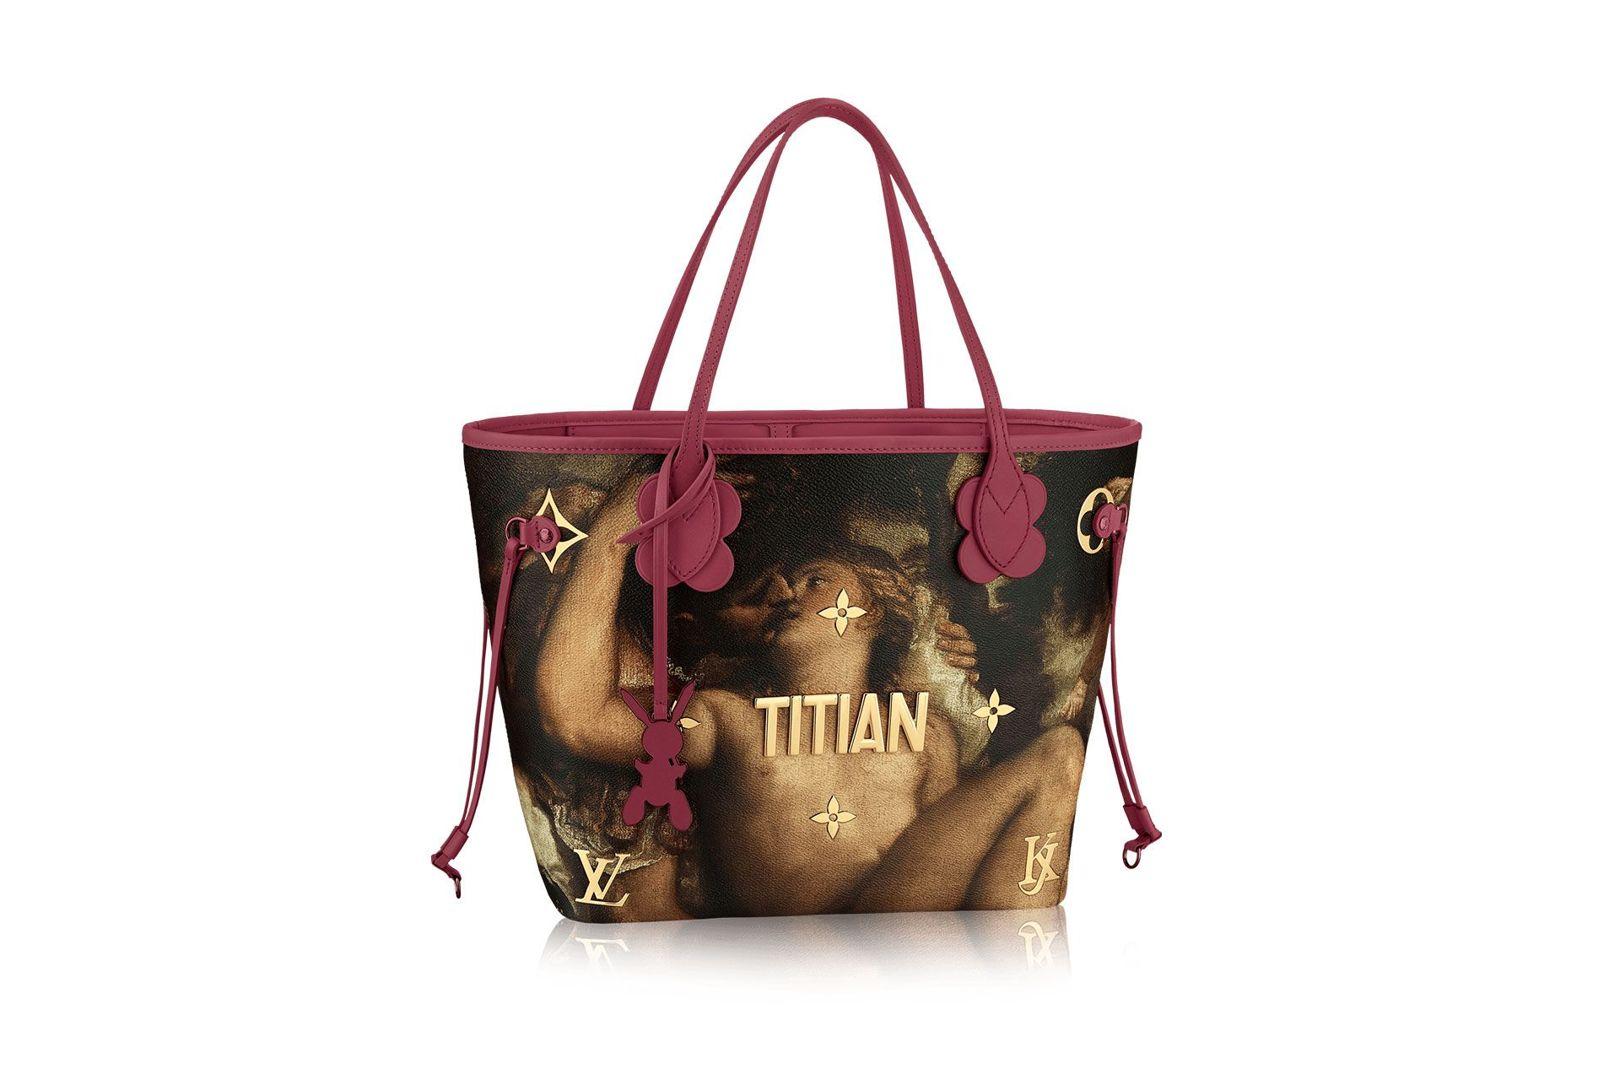 Louis Vuitton Garbage Bag louis vuitton x jeff koons is here to tantalize art (and handbag